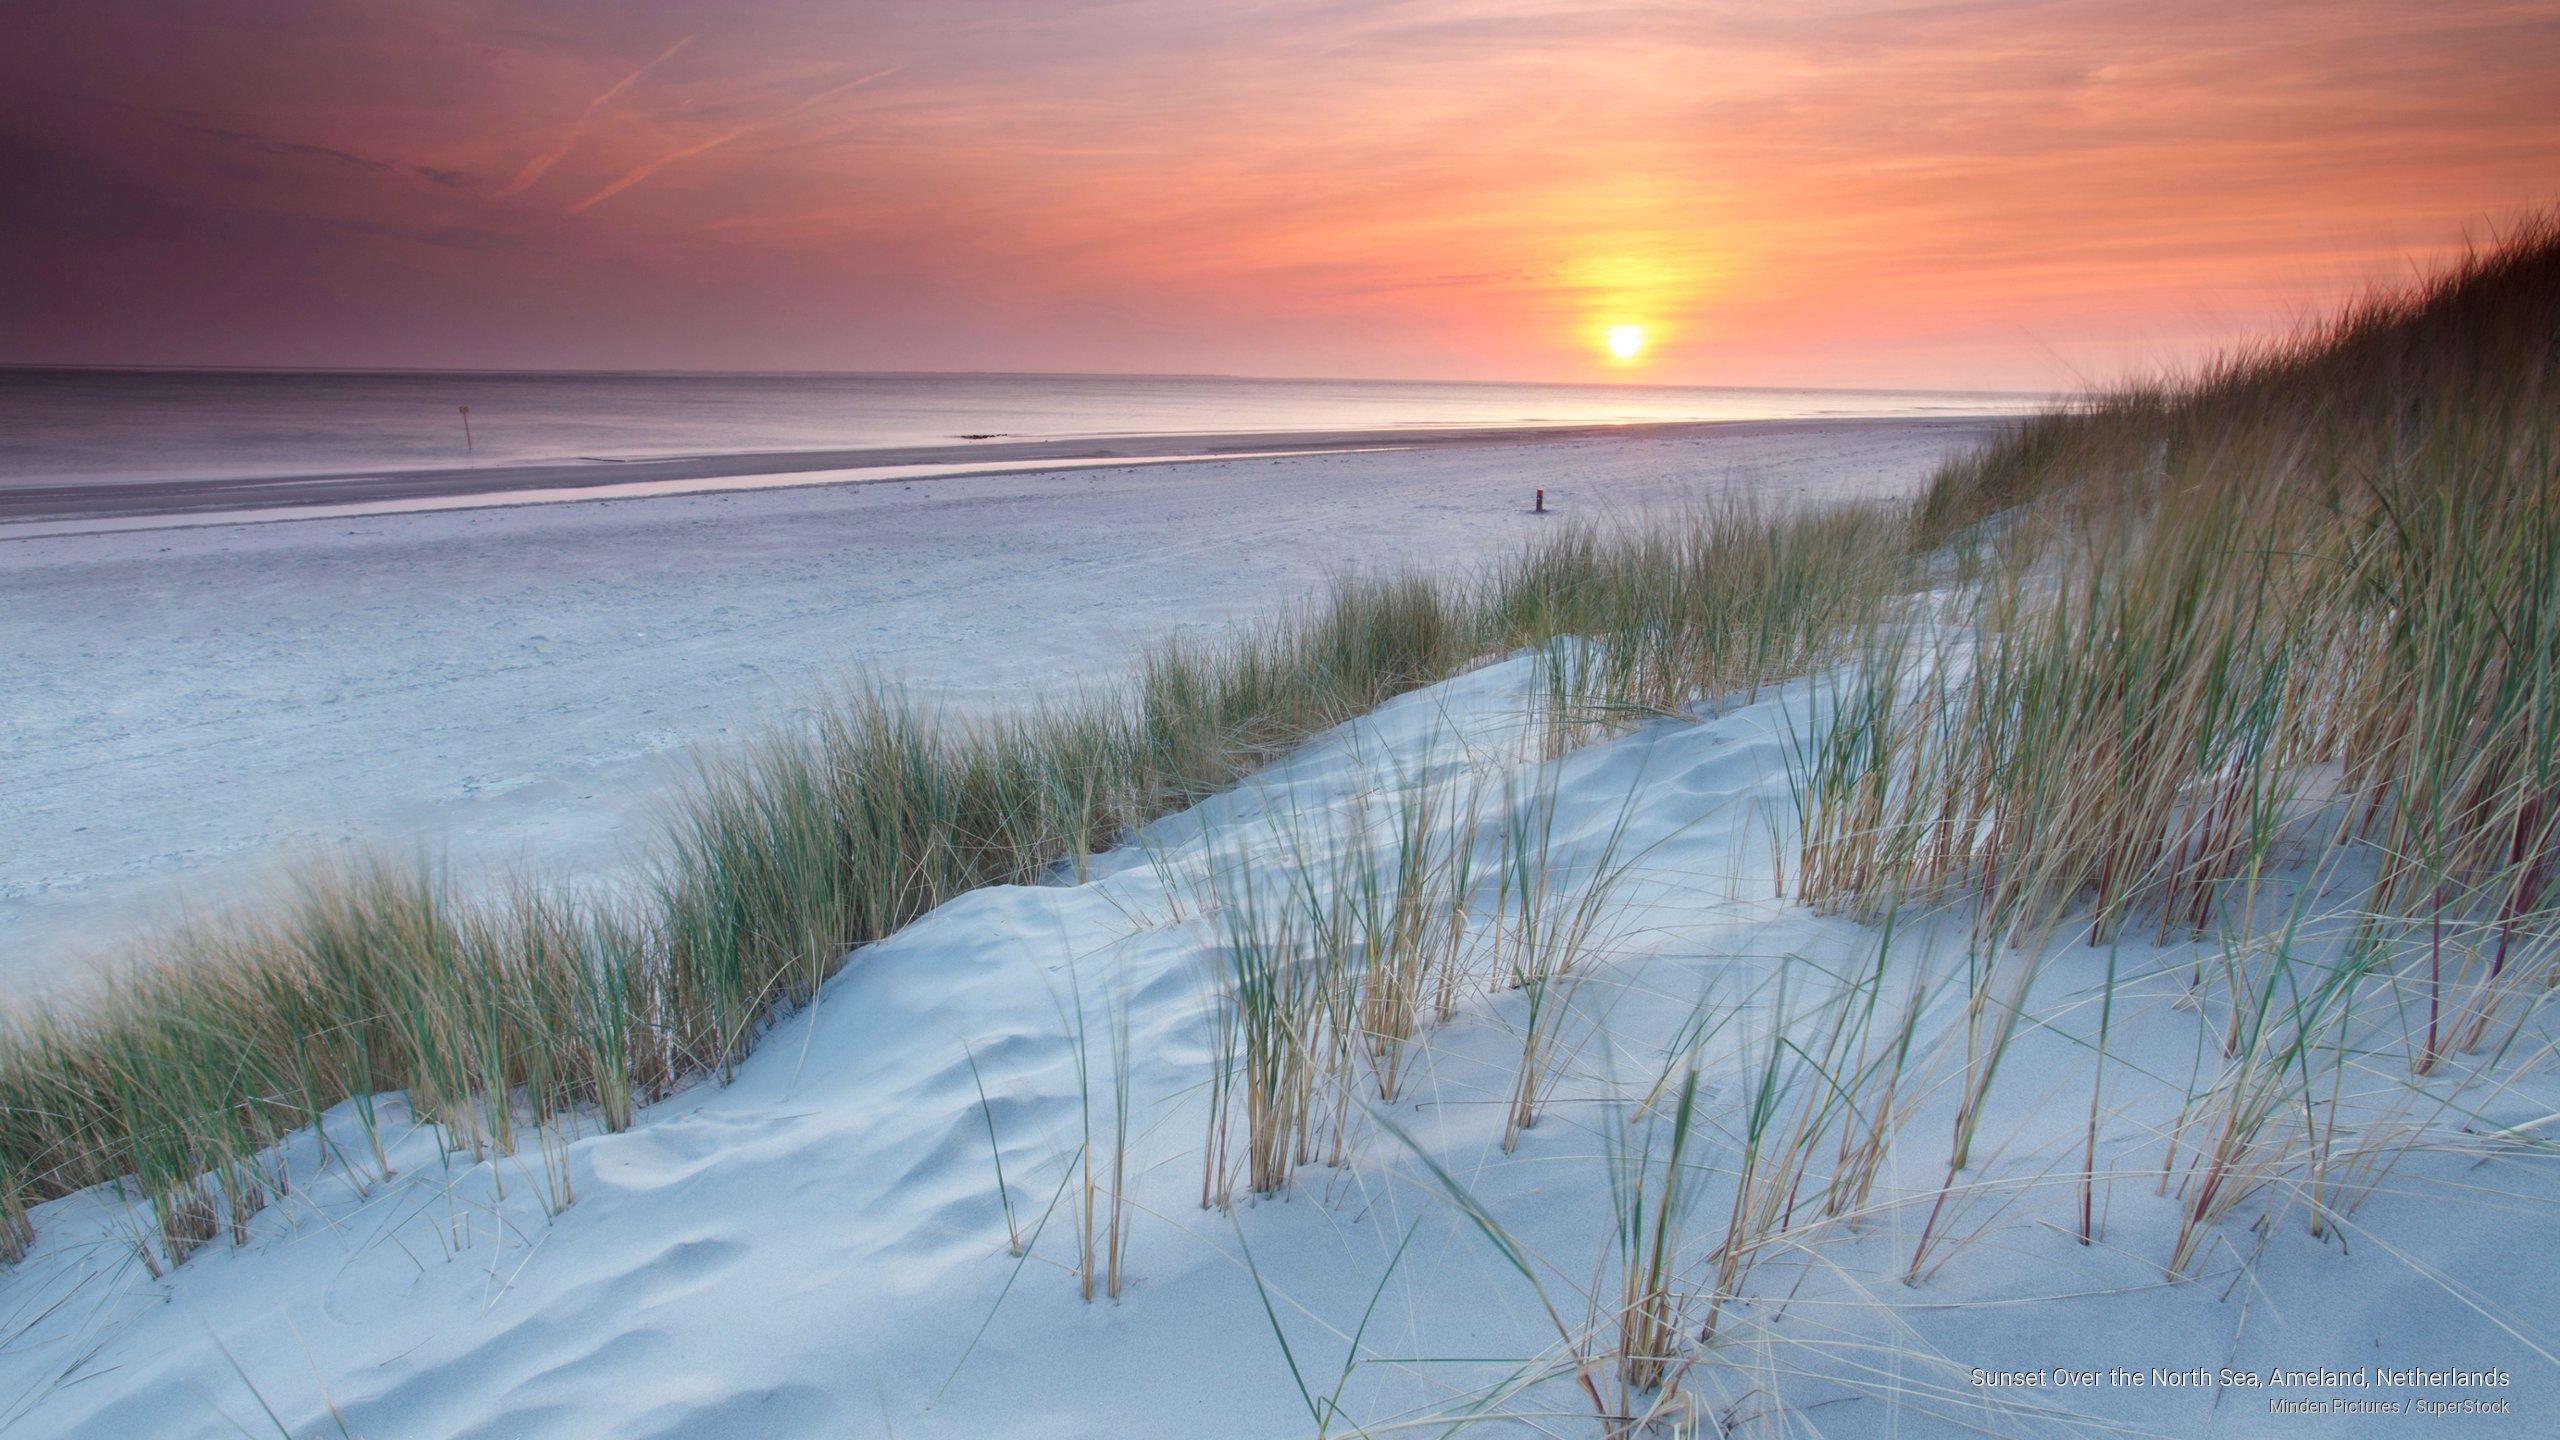 Sunset Over the North Sea, Ameland, Netherlands